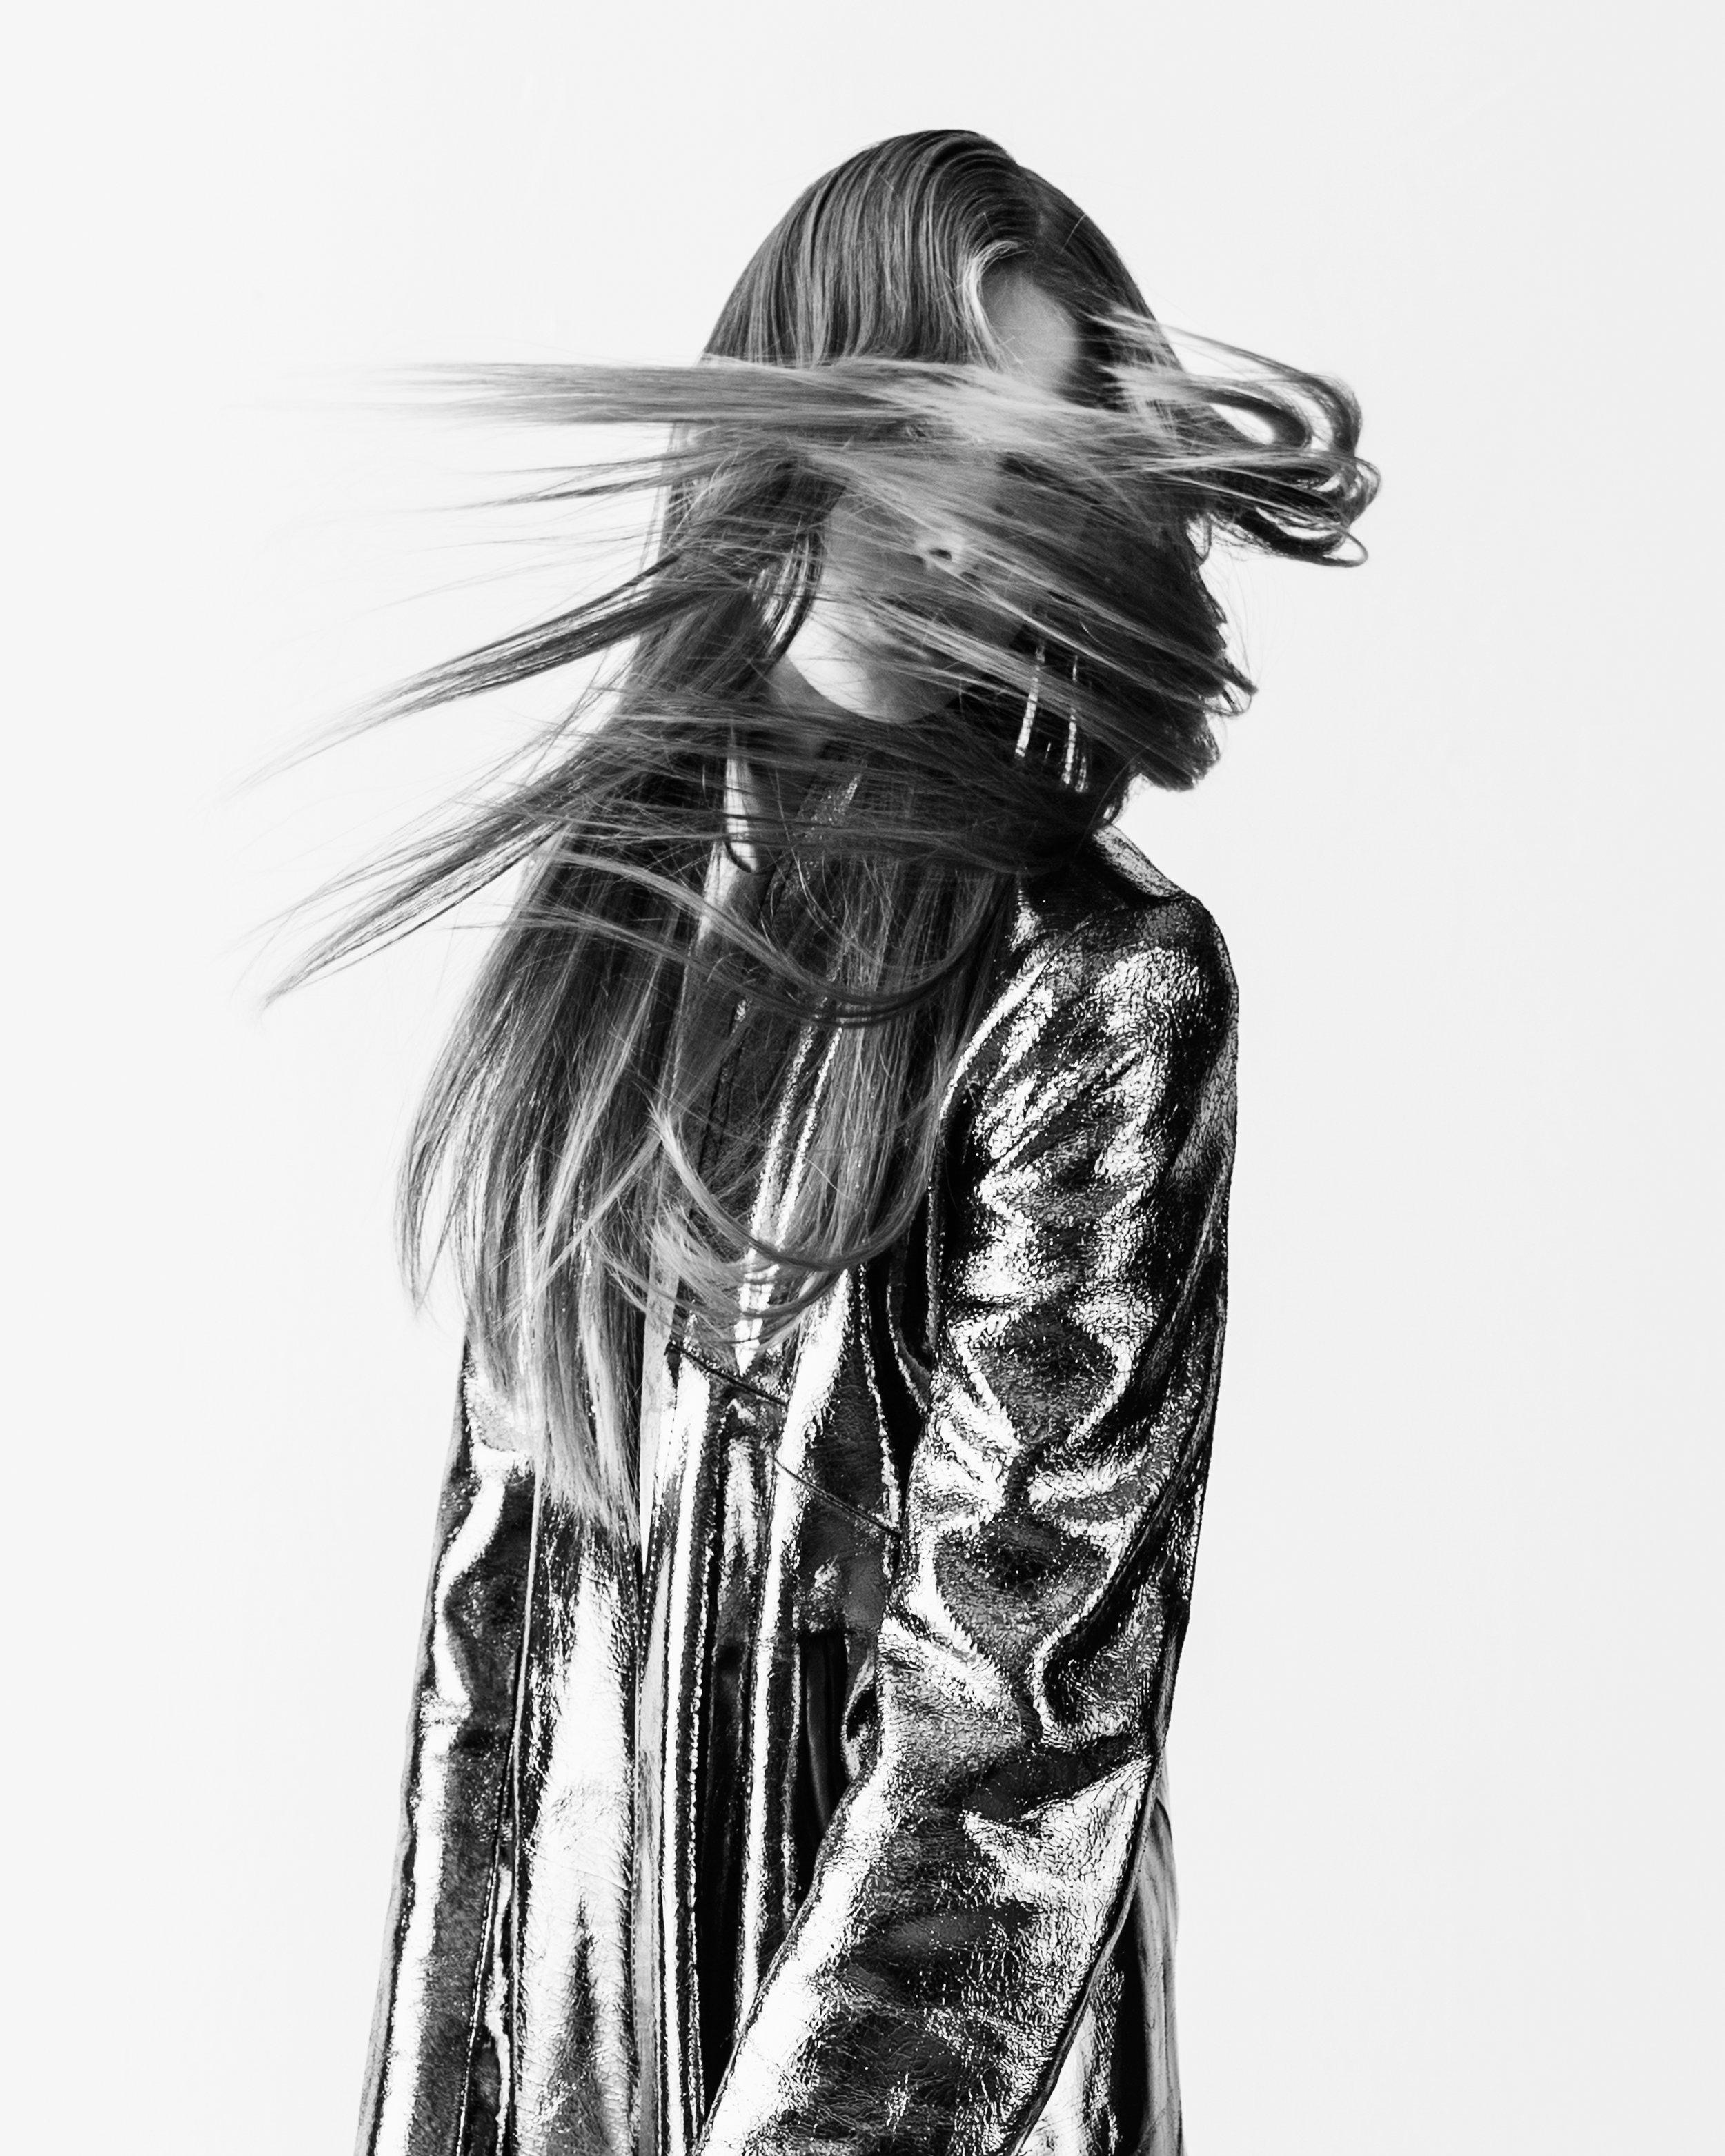 Coat by André Torija, BFA Fashion Design. Dress by Jason Tam, MFA Fashion Design.